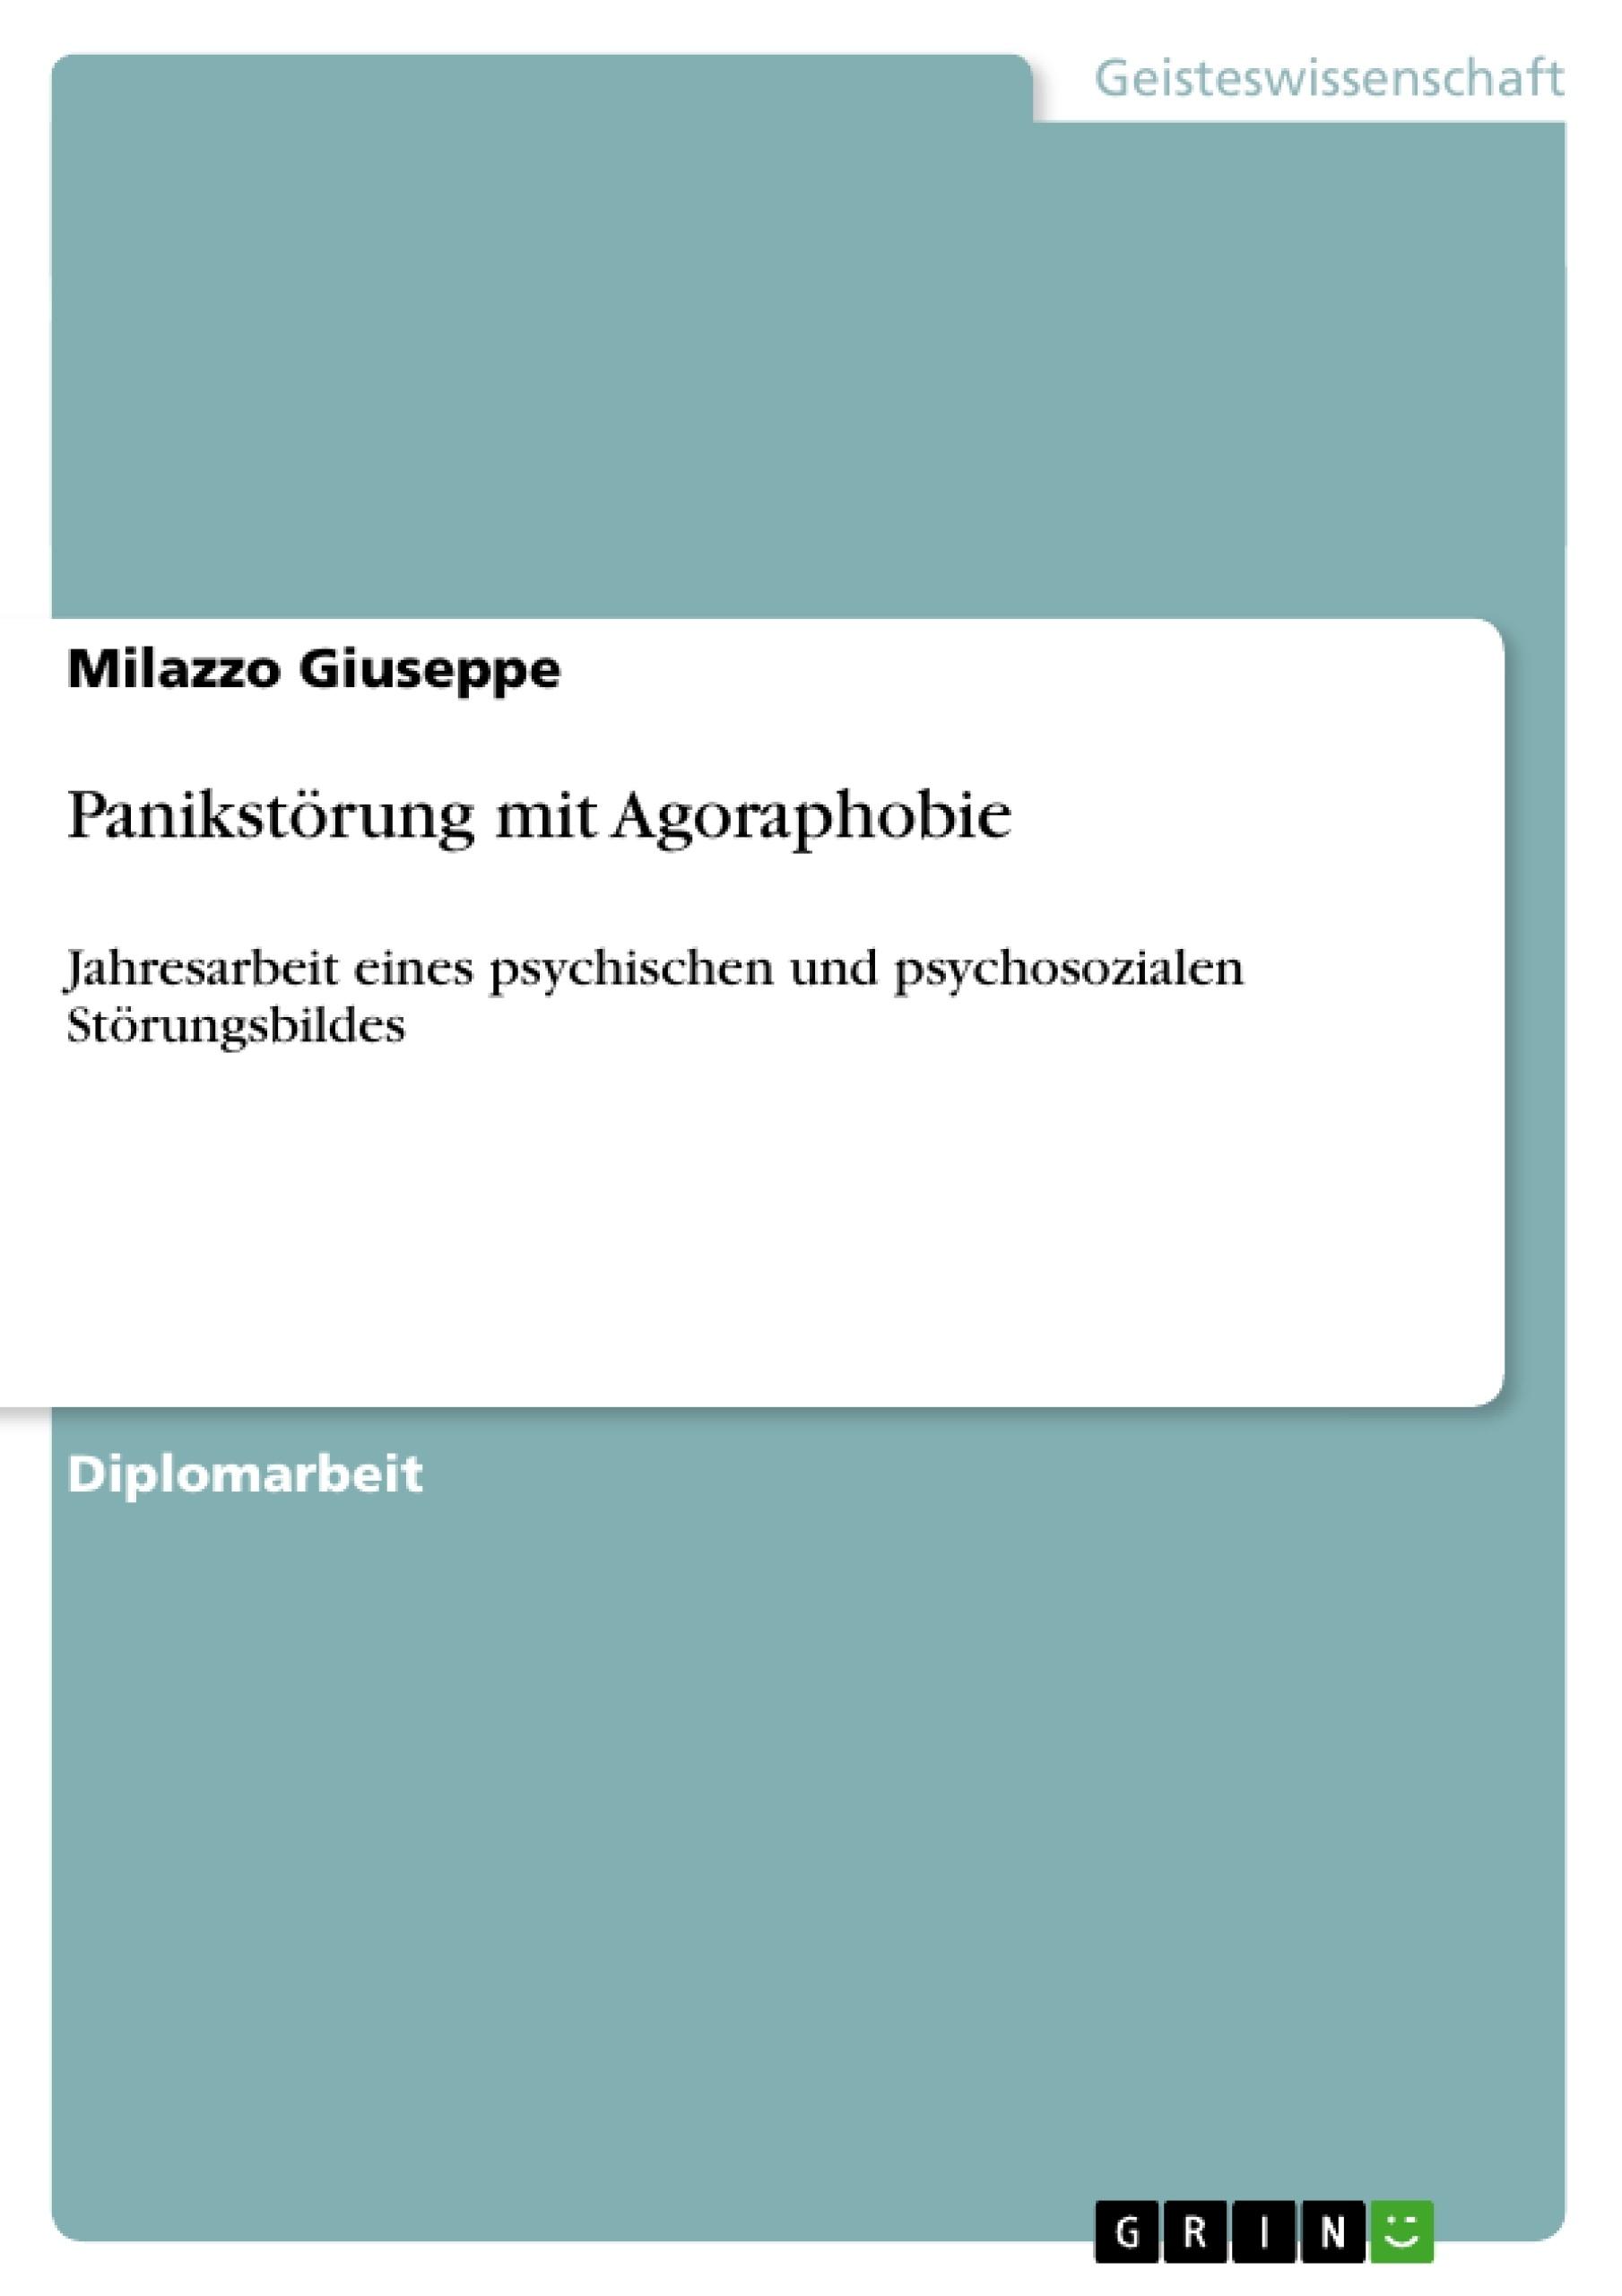 Panikstörung mit Agoraphobie | Masterarbeit, Hausarbeit ...